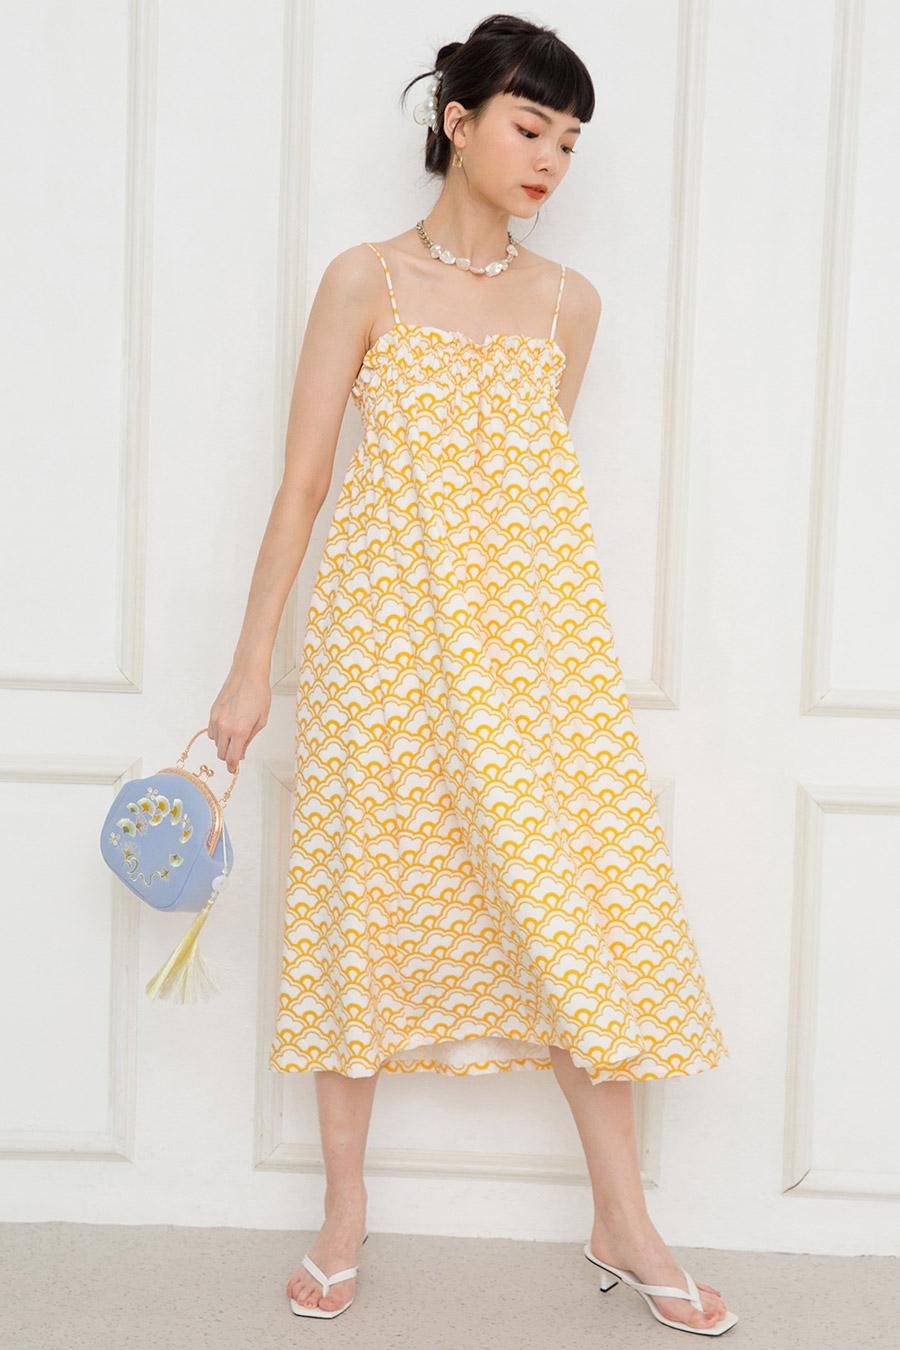 *BO 2* THYGE DRESS - KAIGARA [BY MODPARADE]